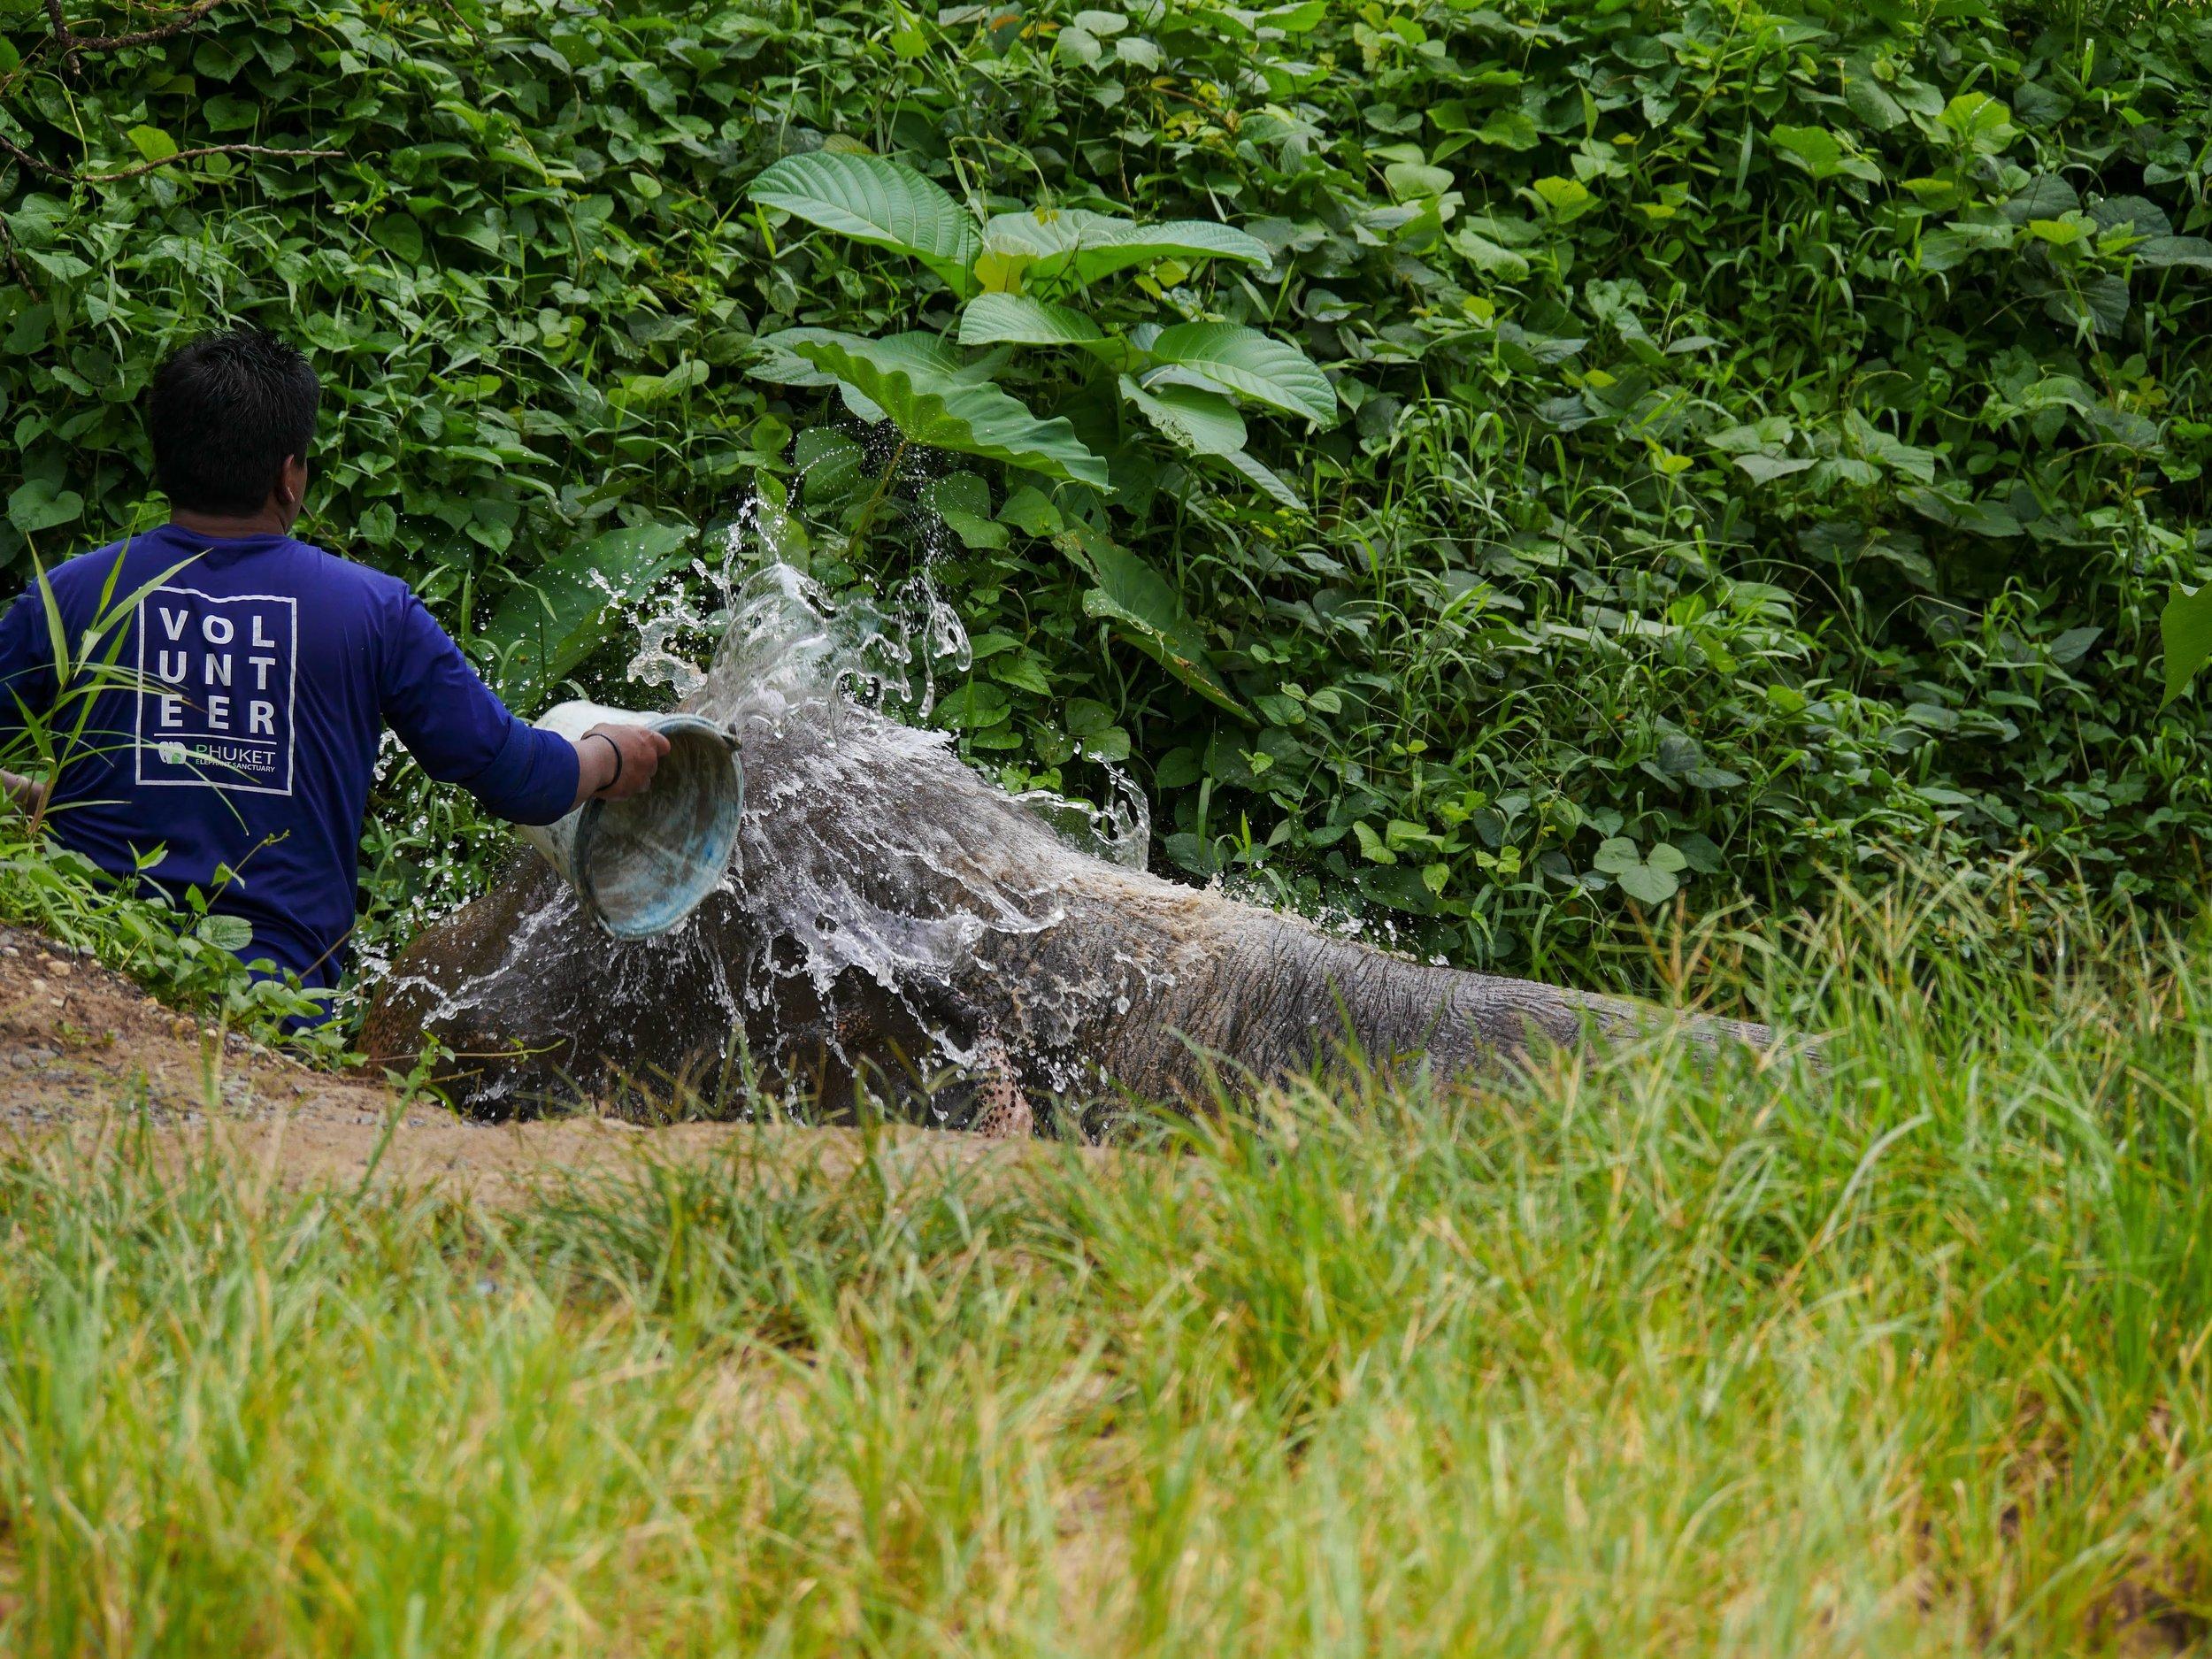 Ekomatkaajat Phuket elefantti.jpg